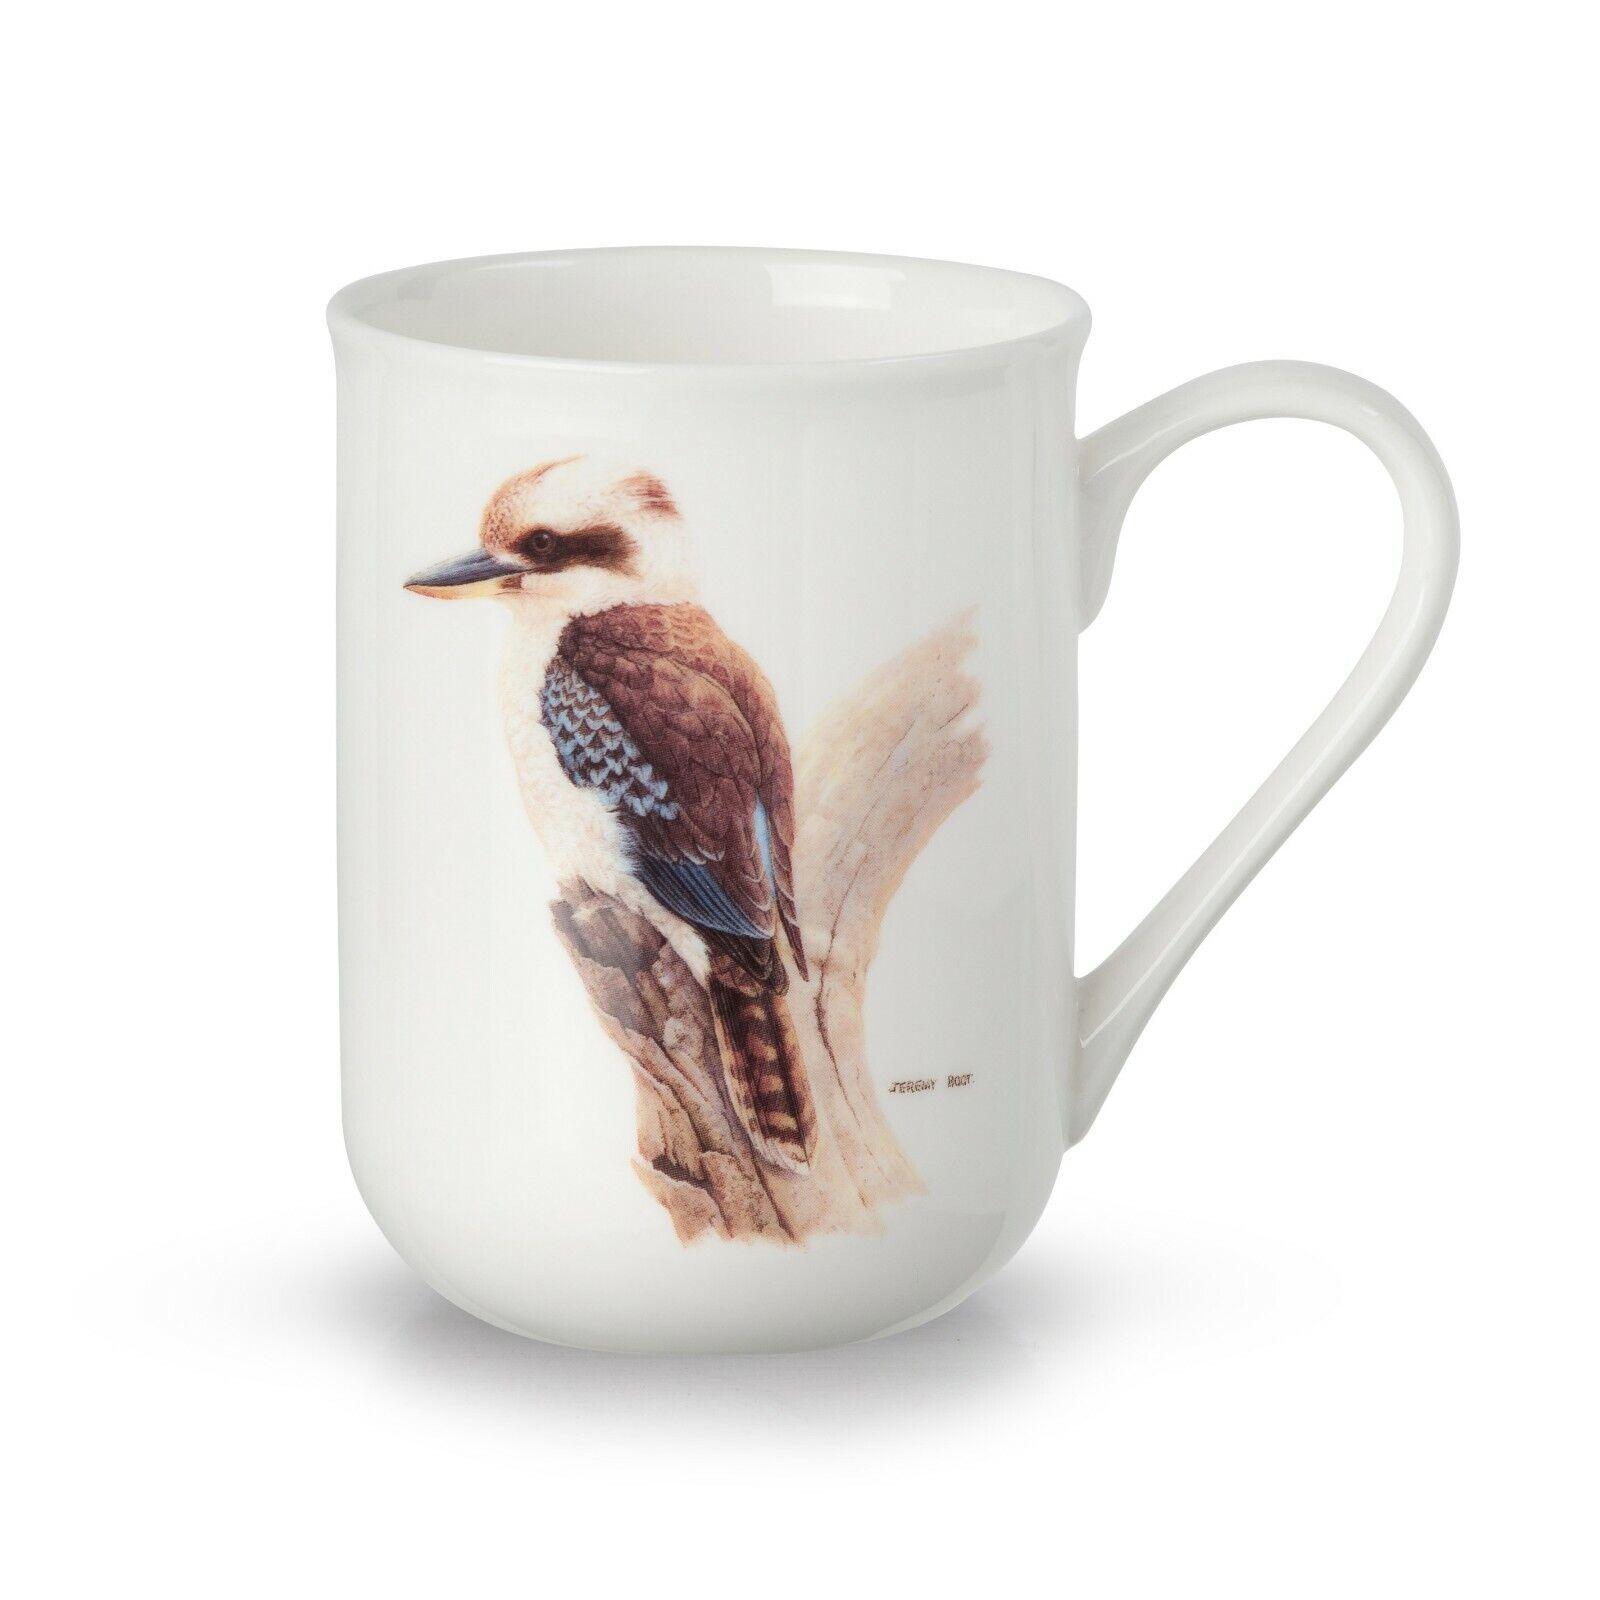 JEREMY BOOT BIRDS OF AUSTRALIA FINE BONE CHINA  SCARED KINGFISHER CUP